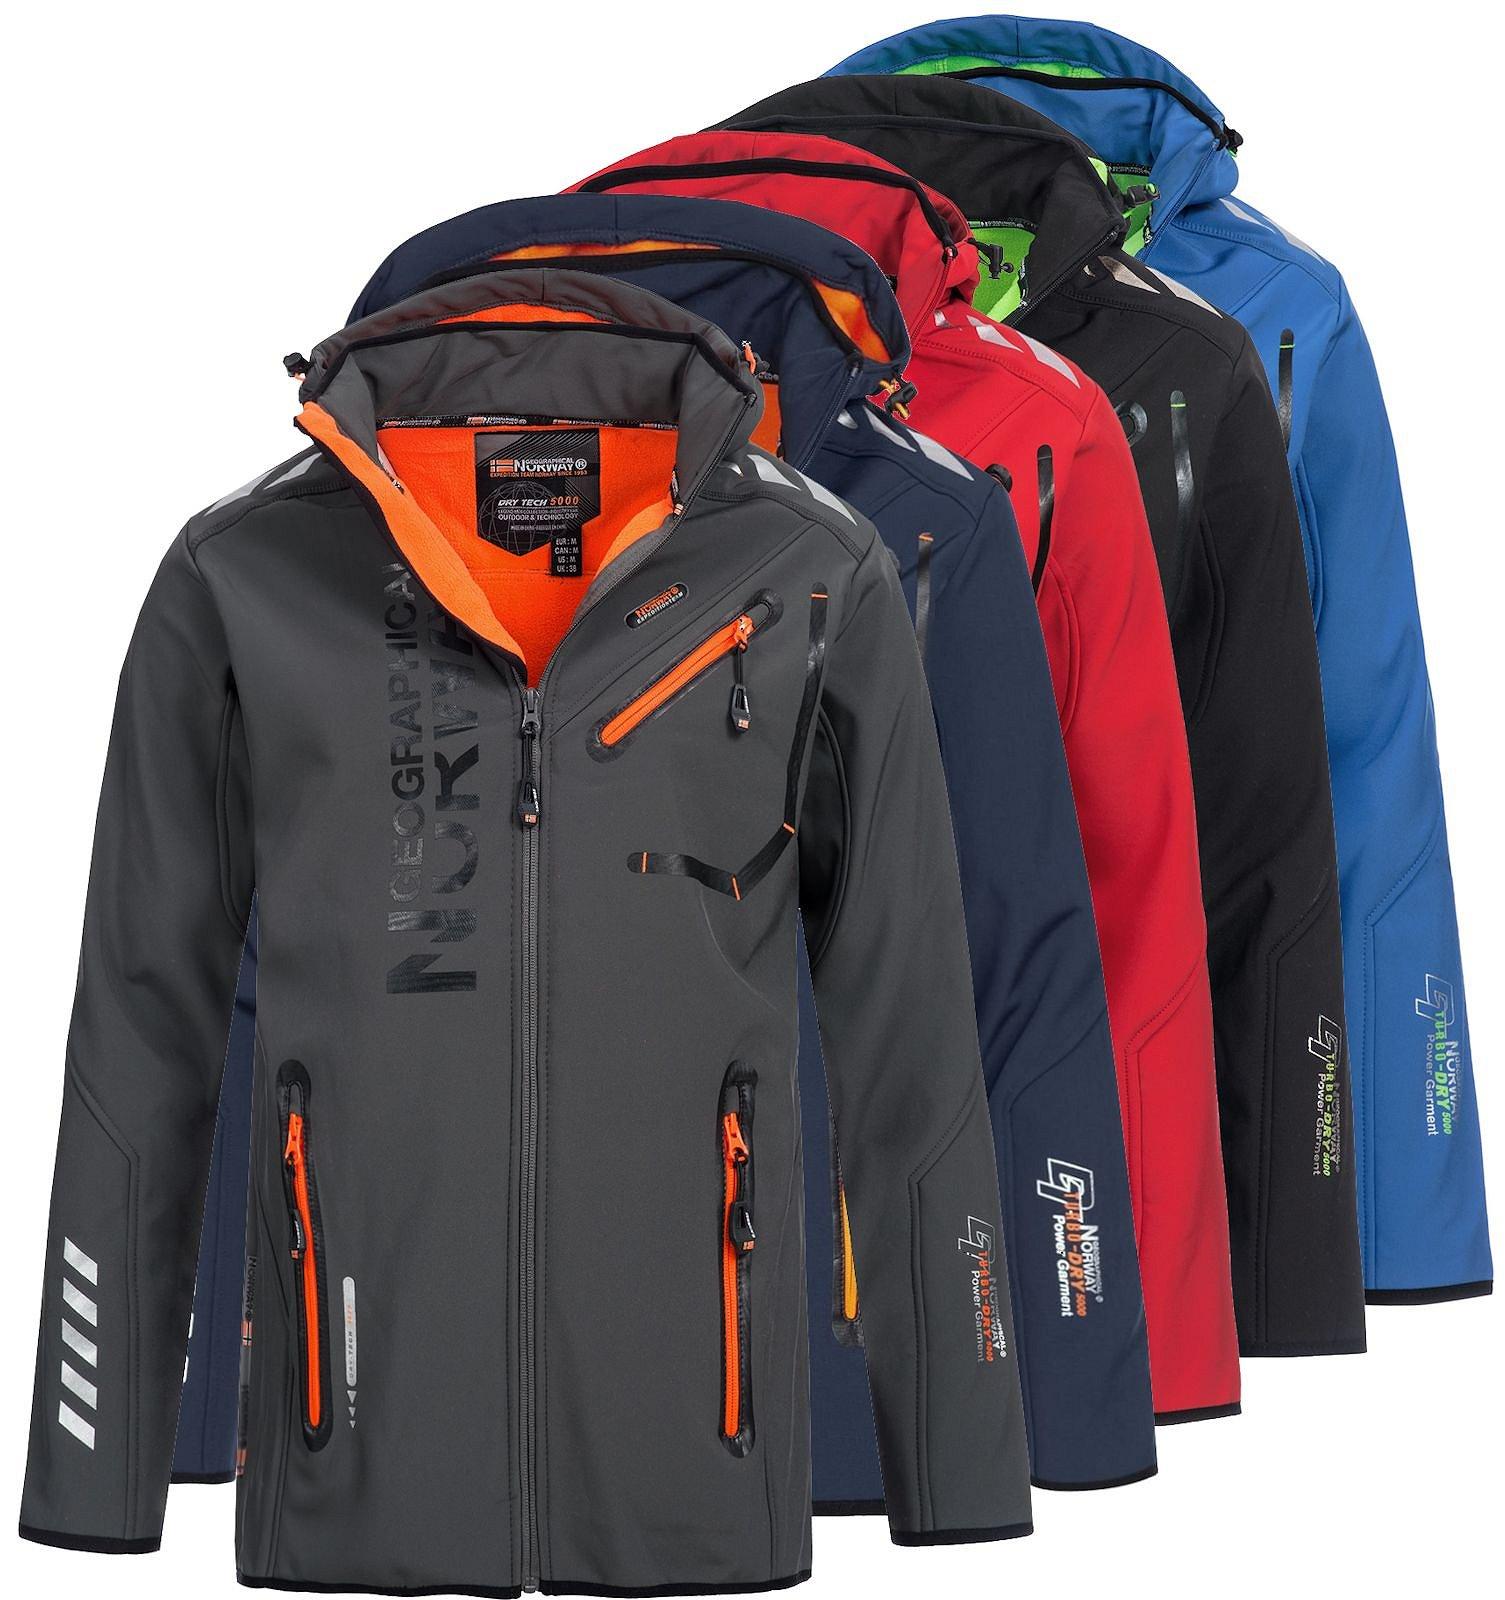 Details about Geographical Norway Mens softshell Jacket Rainman Transition Jacket Jacket Wind Jacket show original title